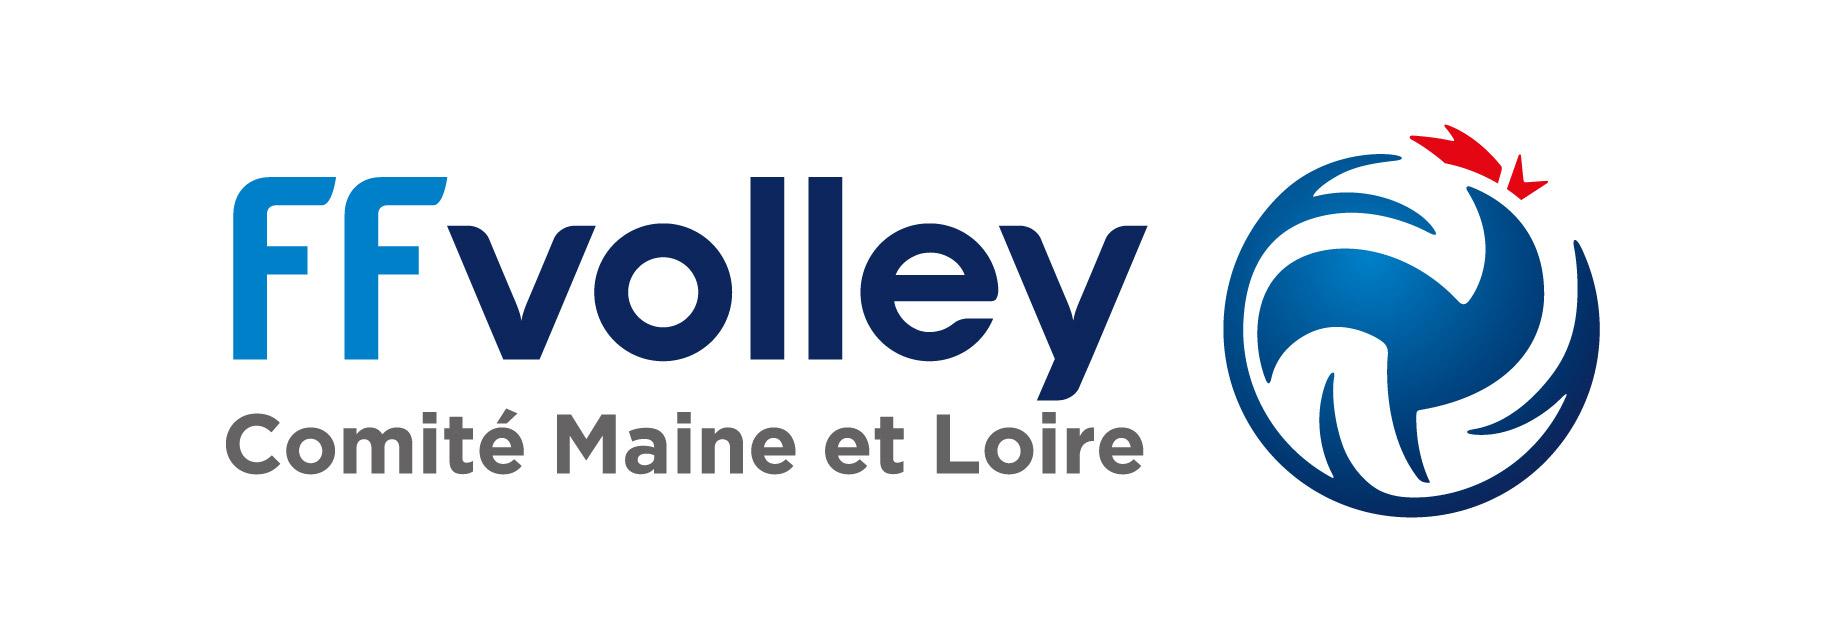 FFVOLLEY_LOGO_COMITE_MAINE_ET_LOIRE_CMJN (1)